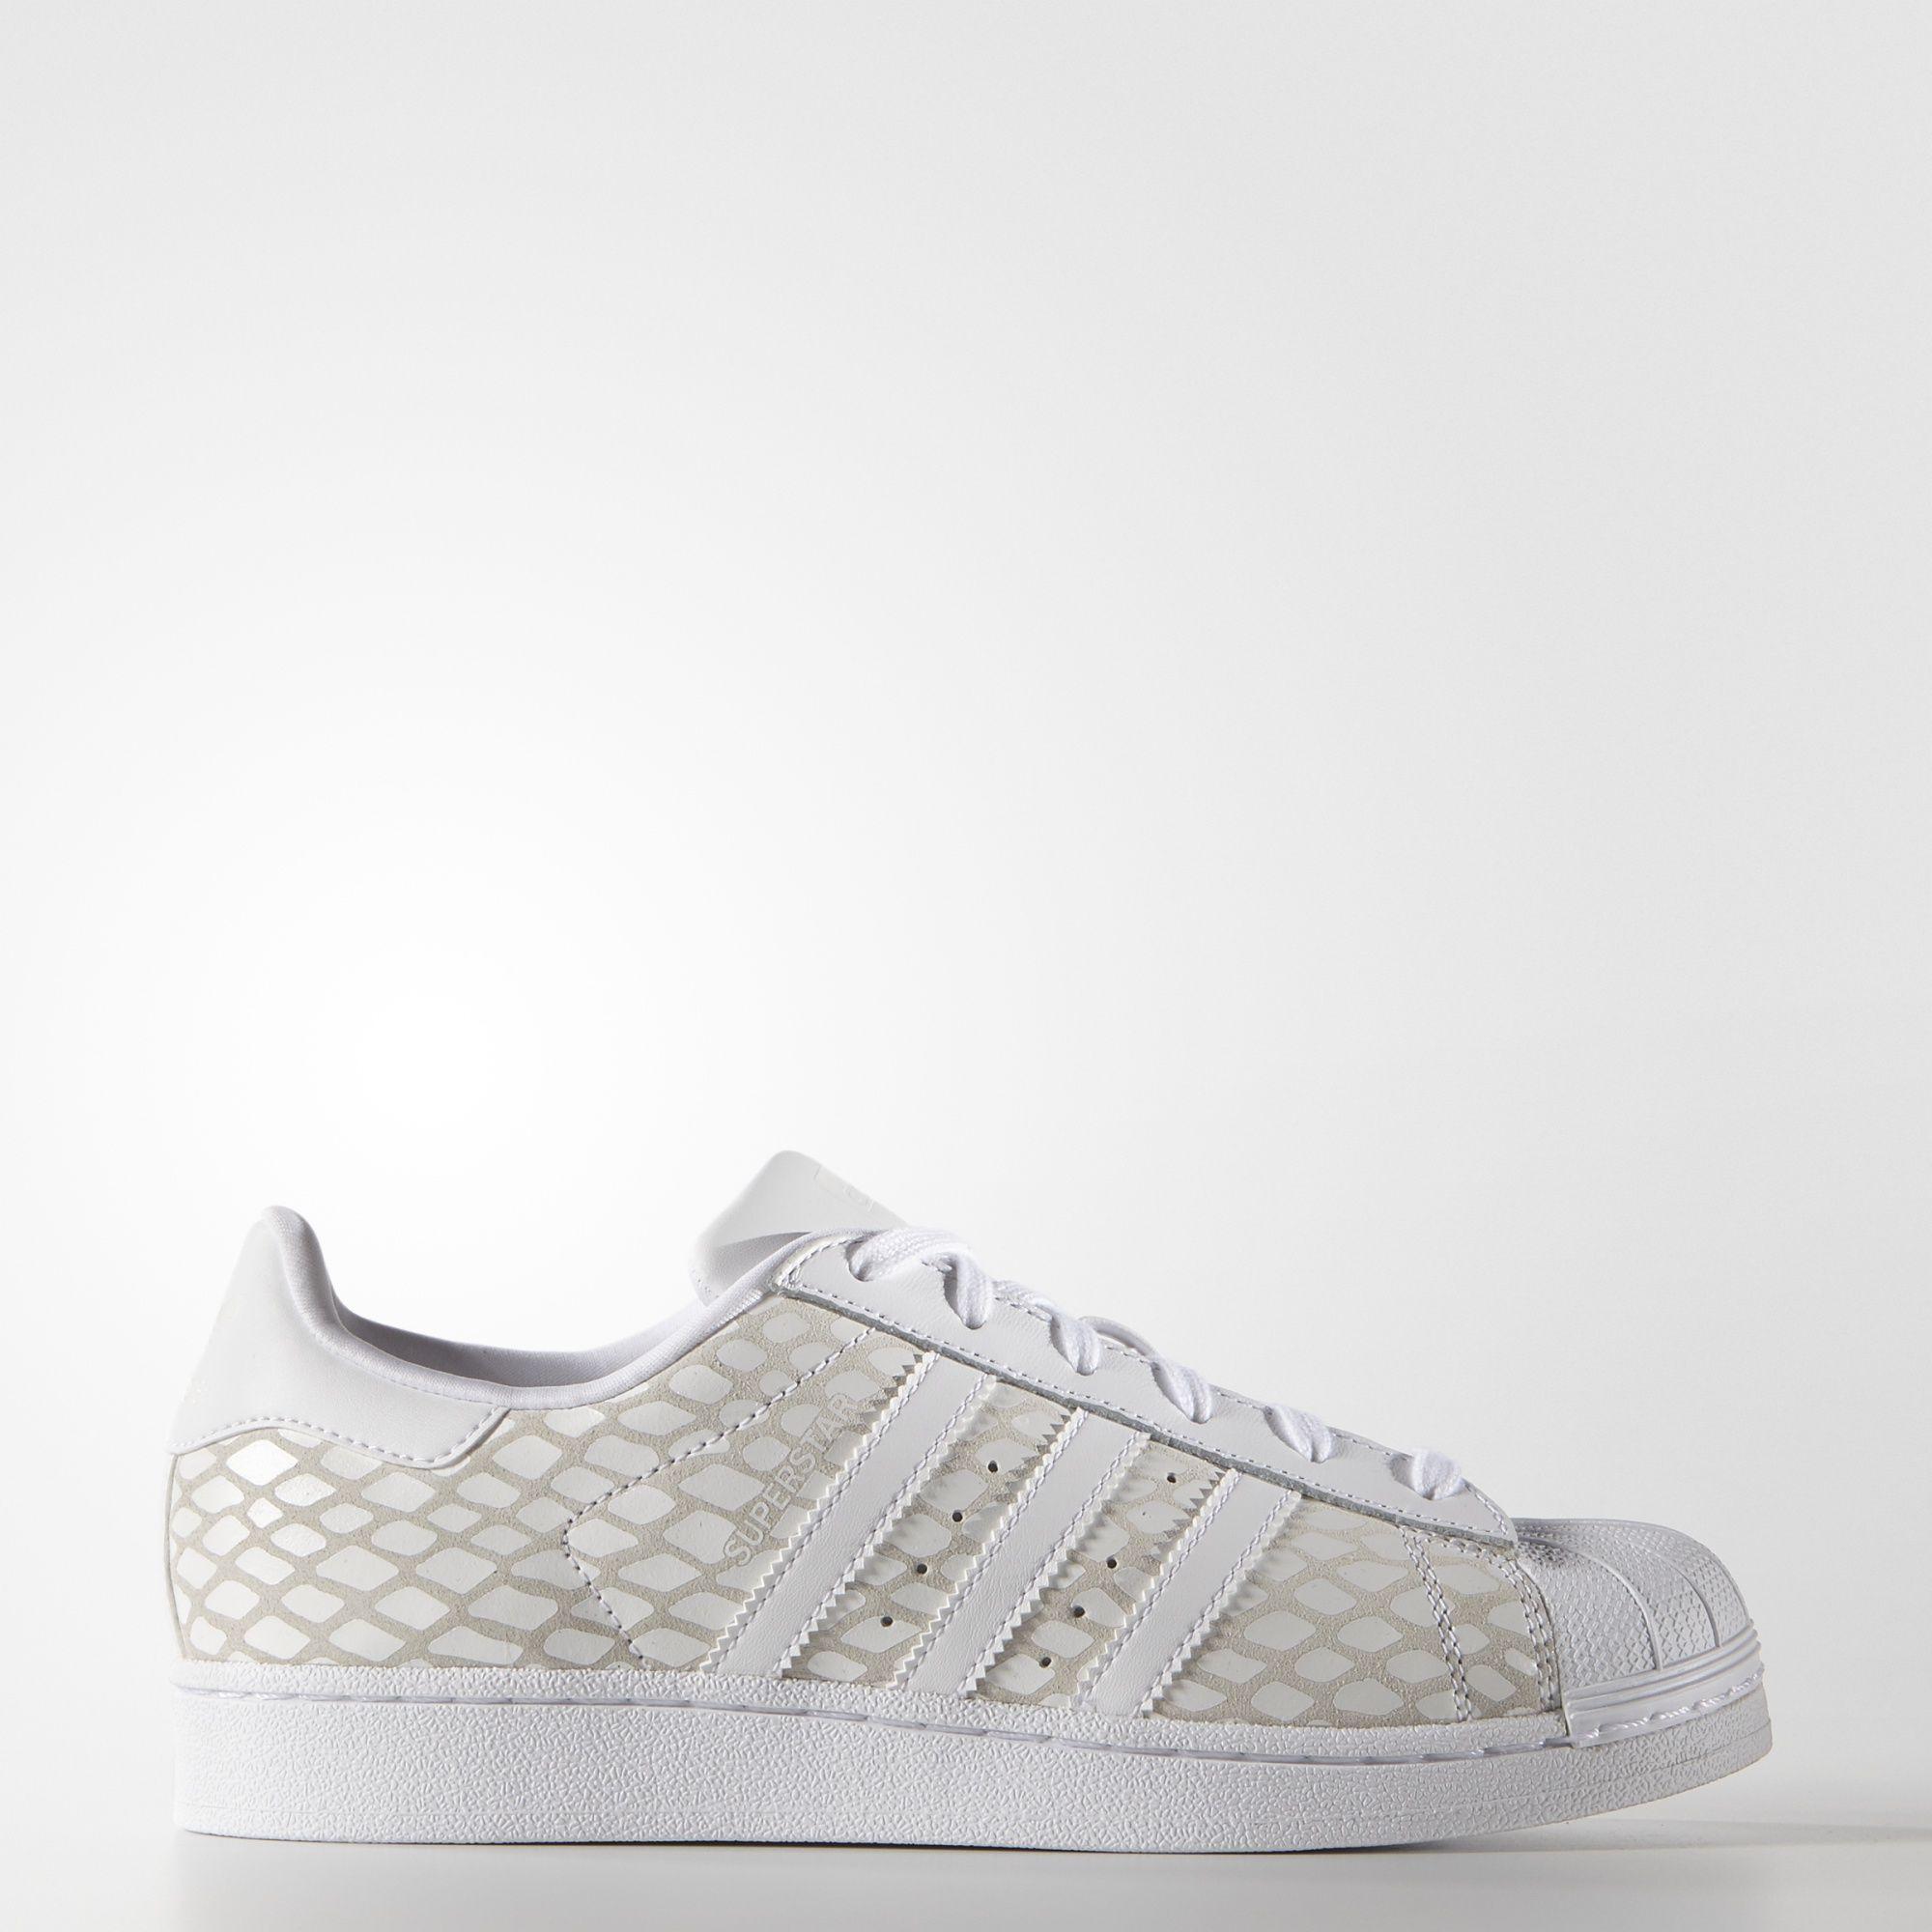 5ac5c8220af adidas - Tênis Superstar Feminino